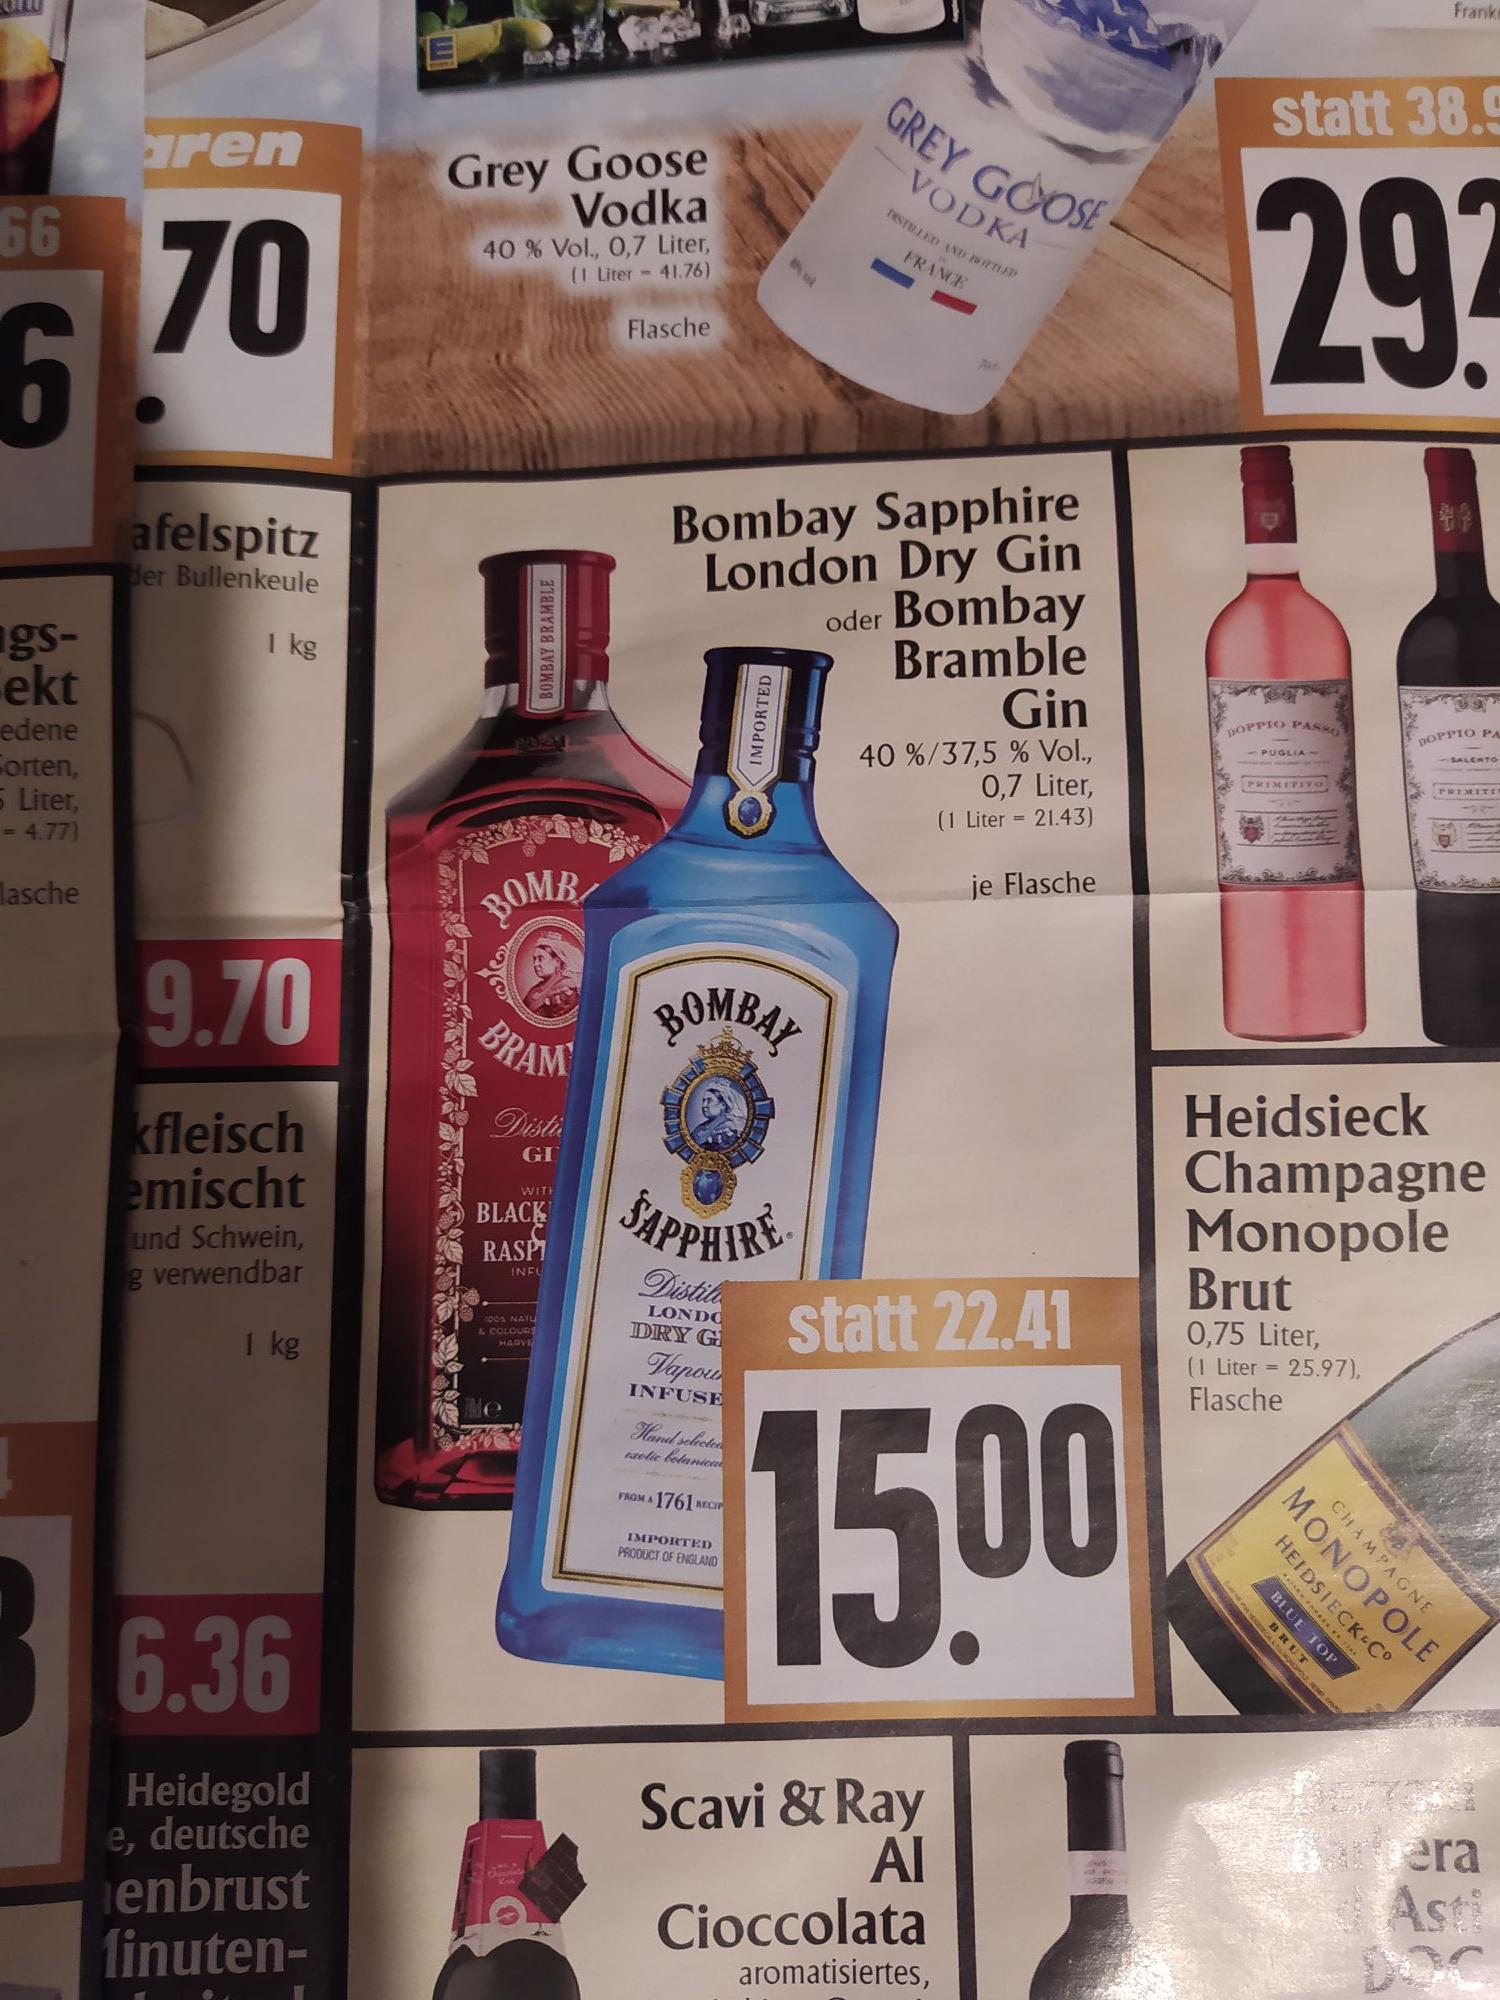 Bombay Saphire oder Bramble Gin